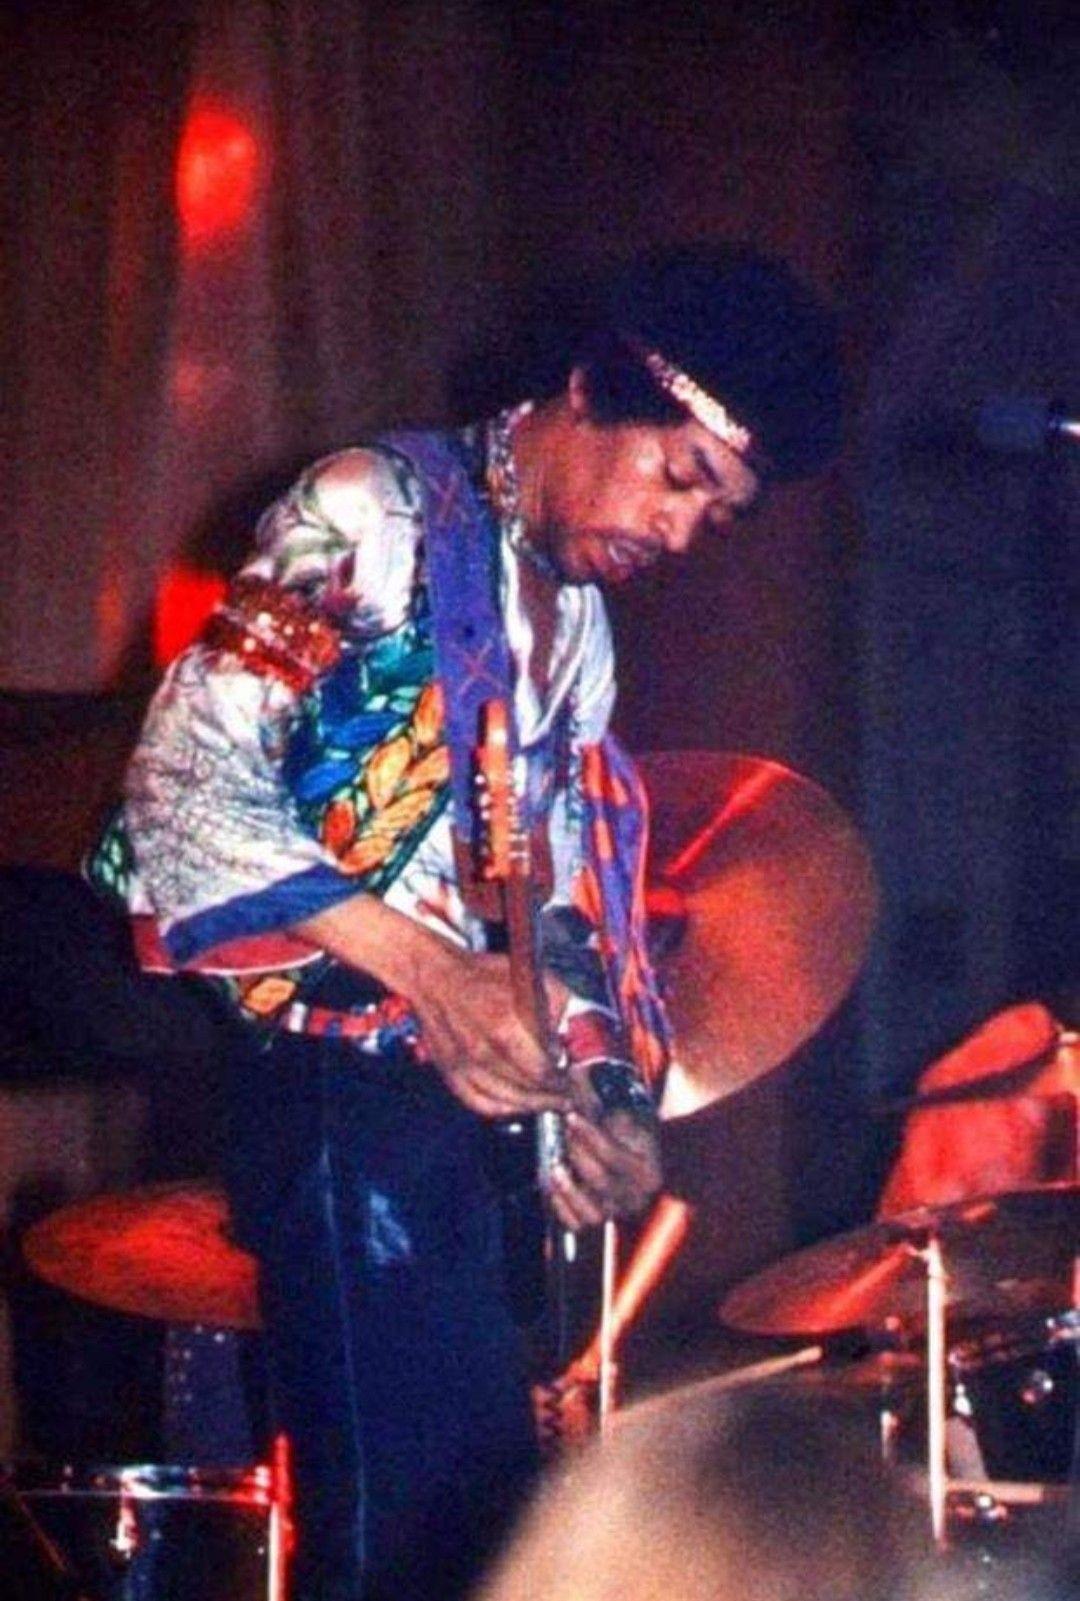 Pin By Laura On Jimi Hendrix Jimi Hendrix Experience Jimi Hendrix Hendrix